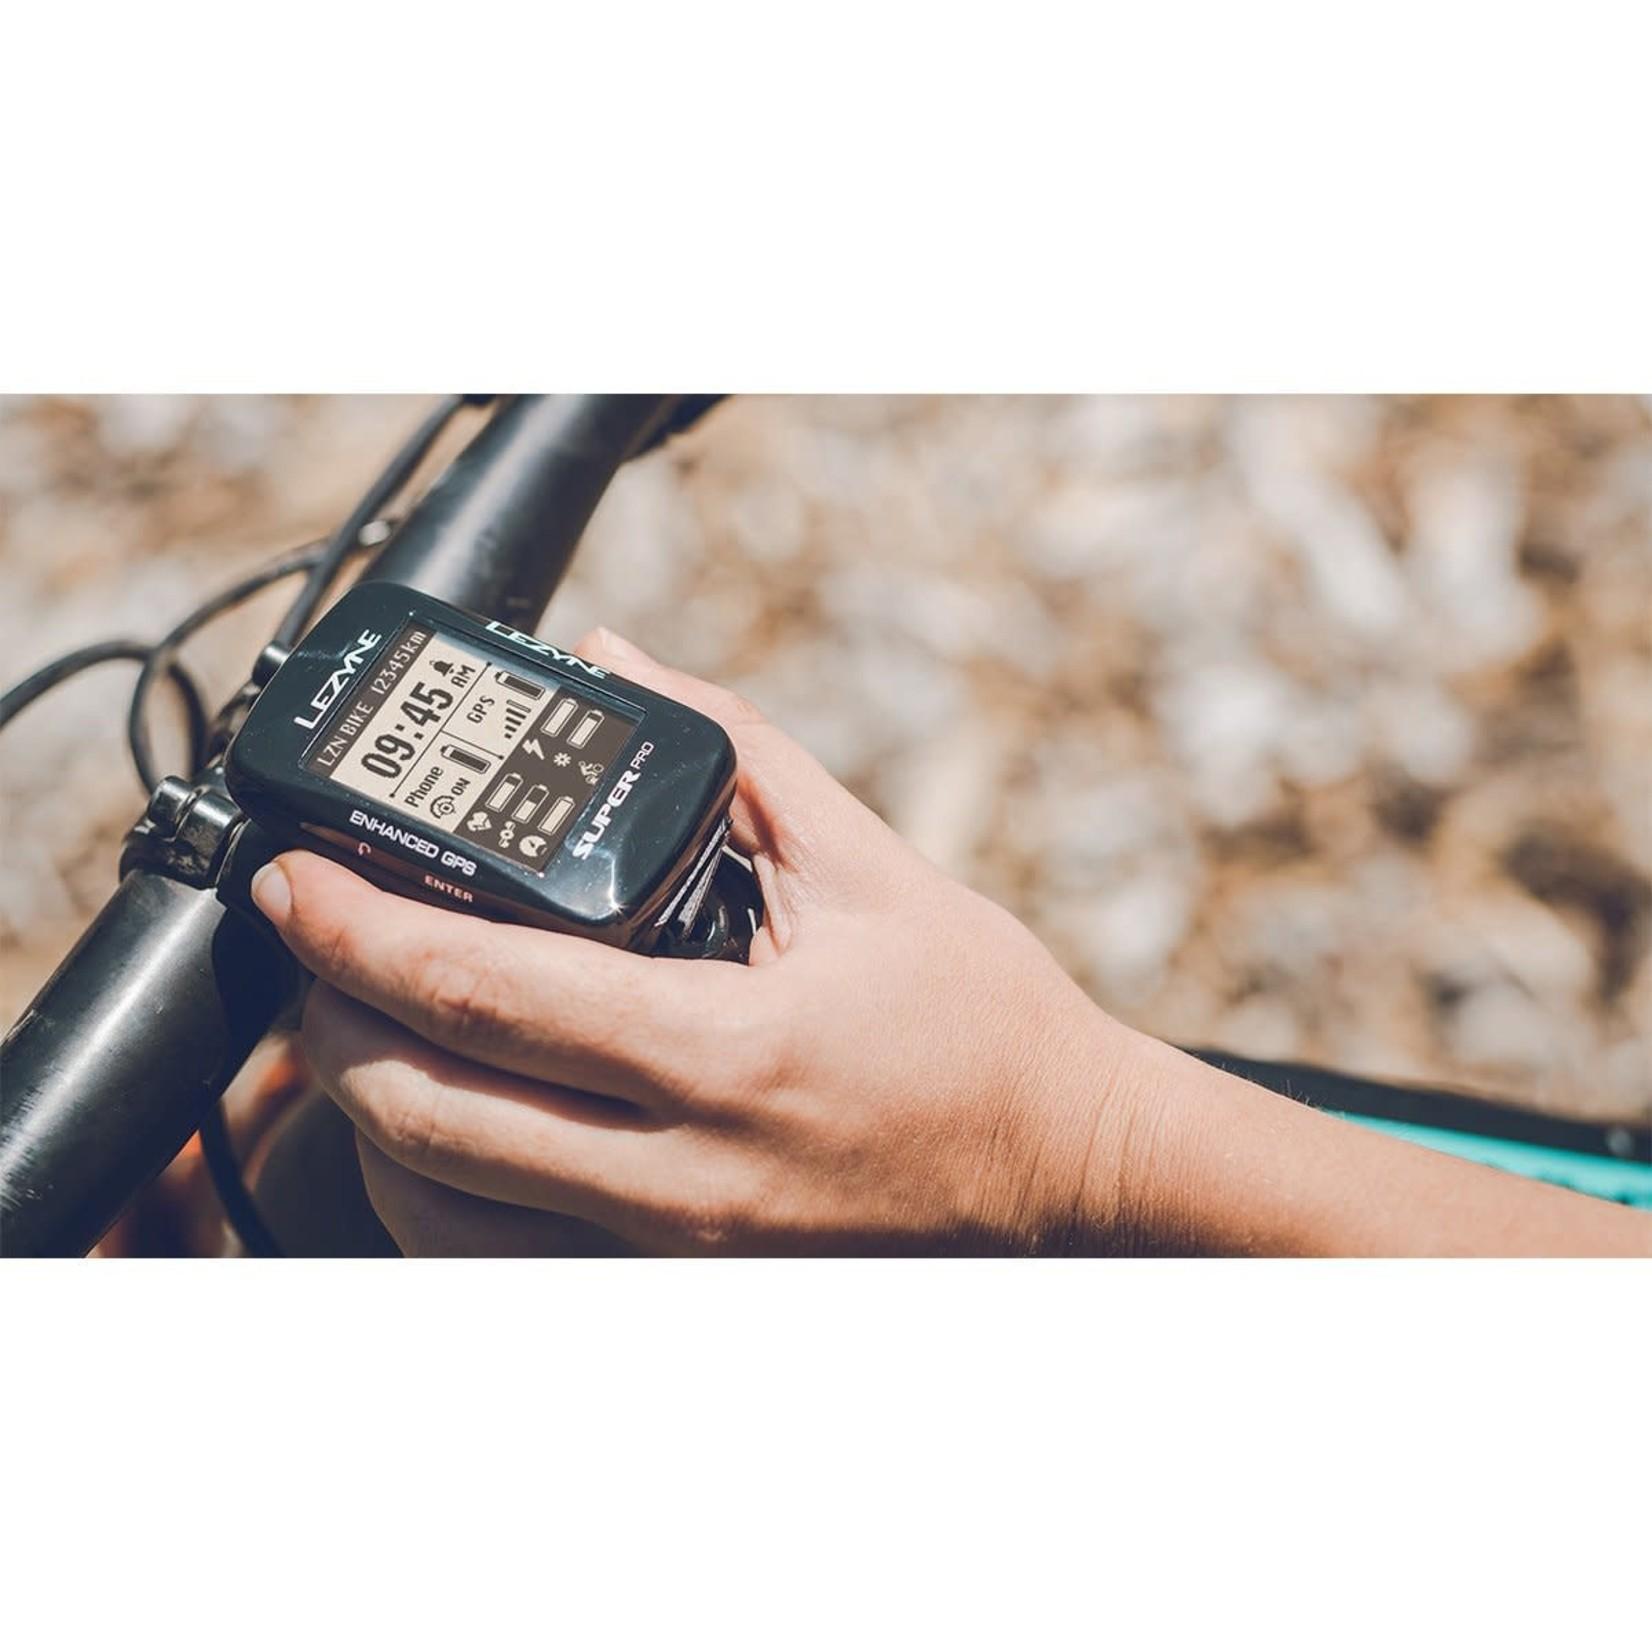 Lezyne Lezyne Super Pro GPS Loaded Bike Computer - GPS, Wireless, Heart Rate Monitor, Speed, Cadence, Black